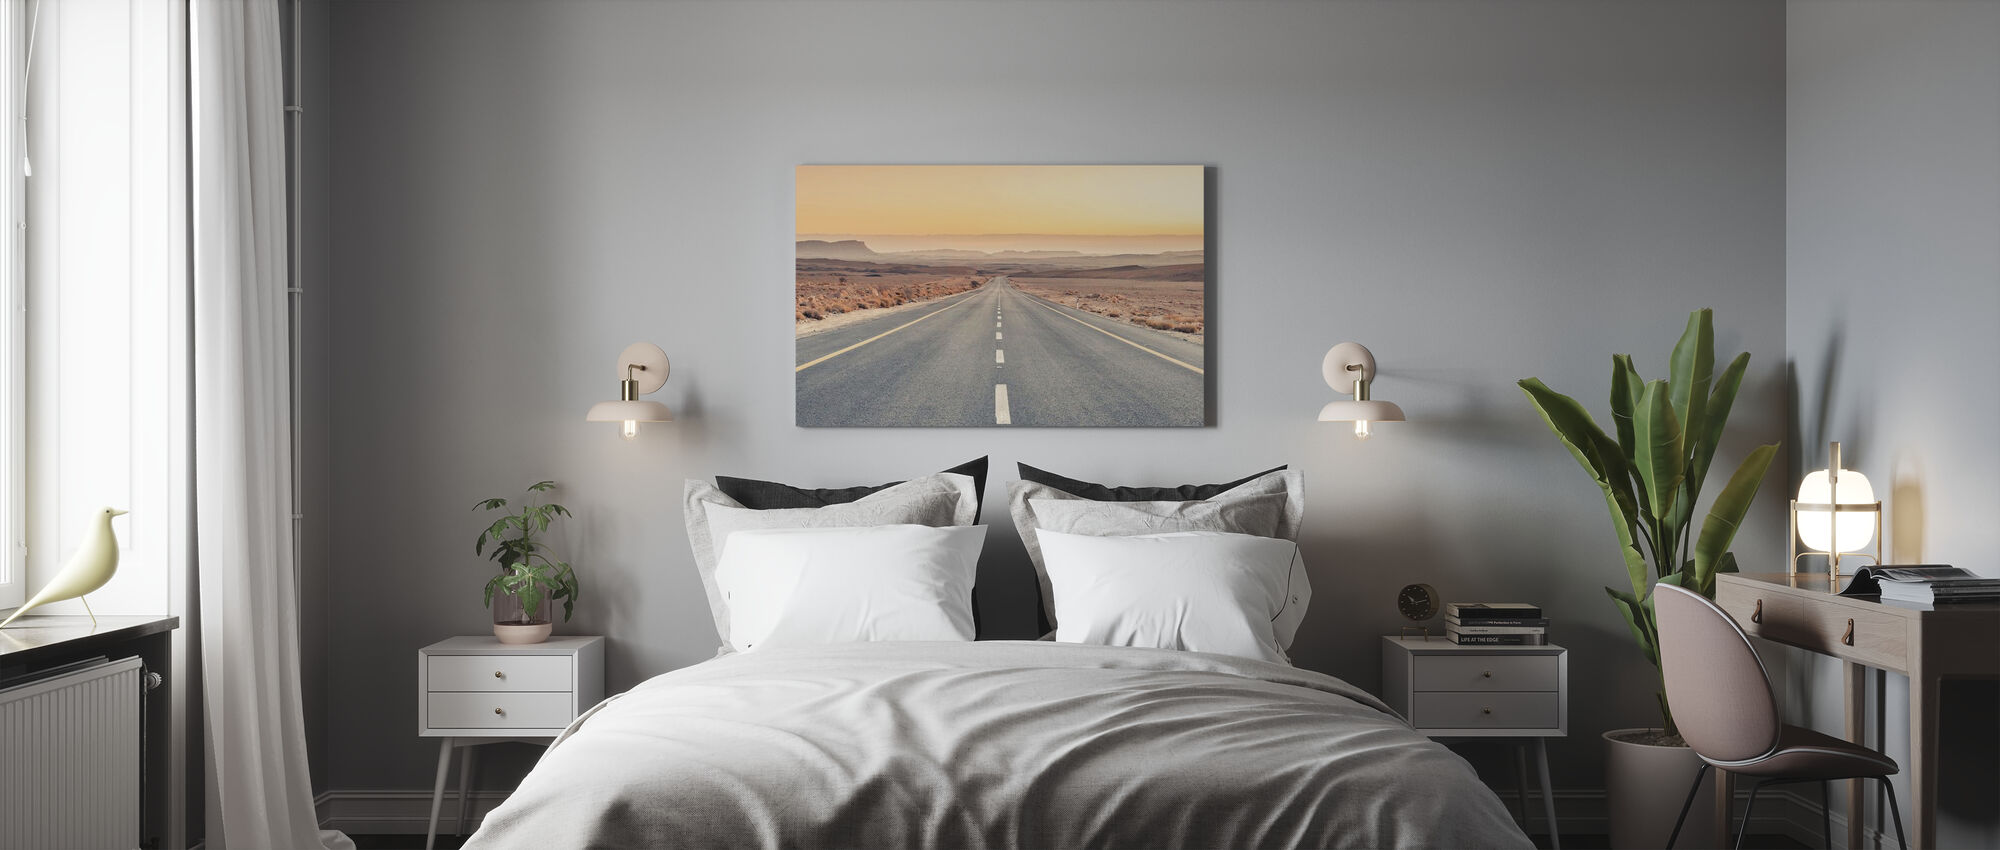 Desert Road - Canvas print - Bedroom